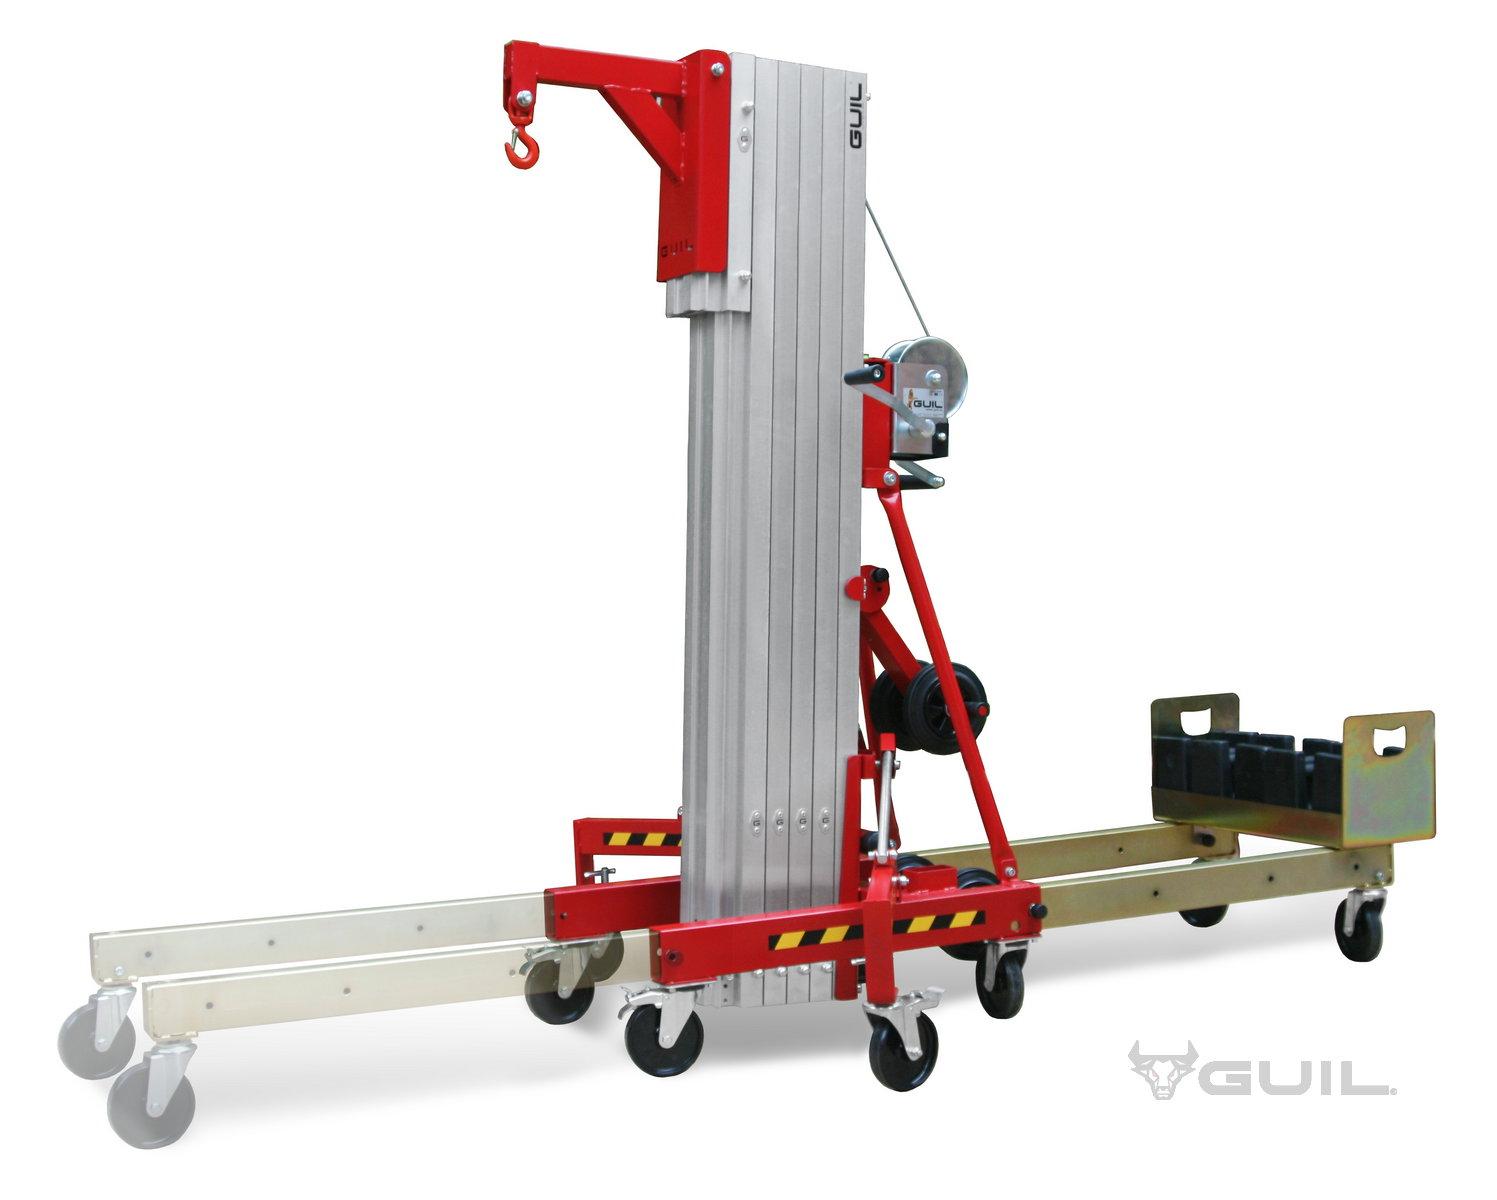 Kanaallift 6,5 m 400 kg (dutch) (8)